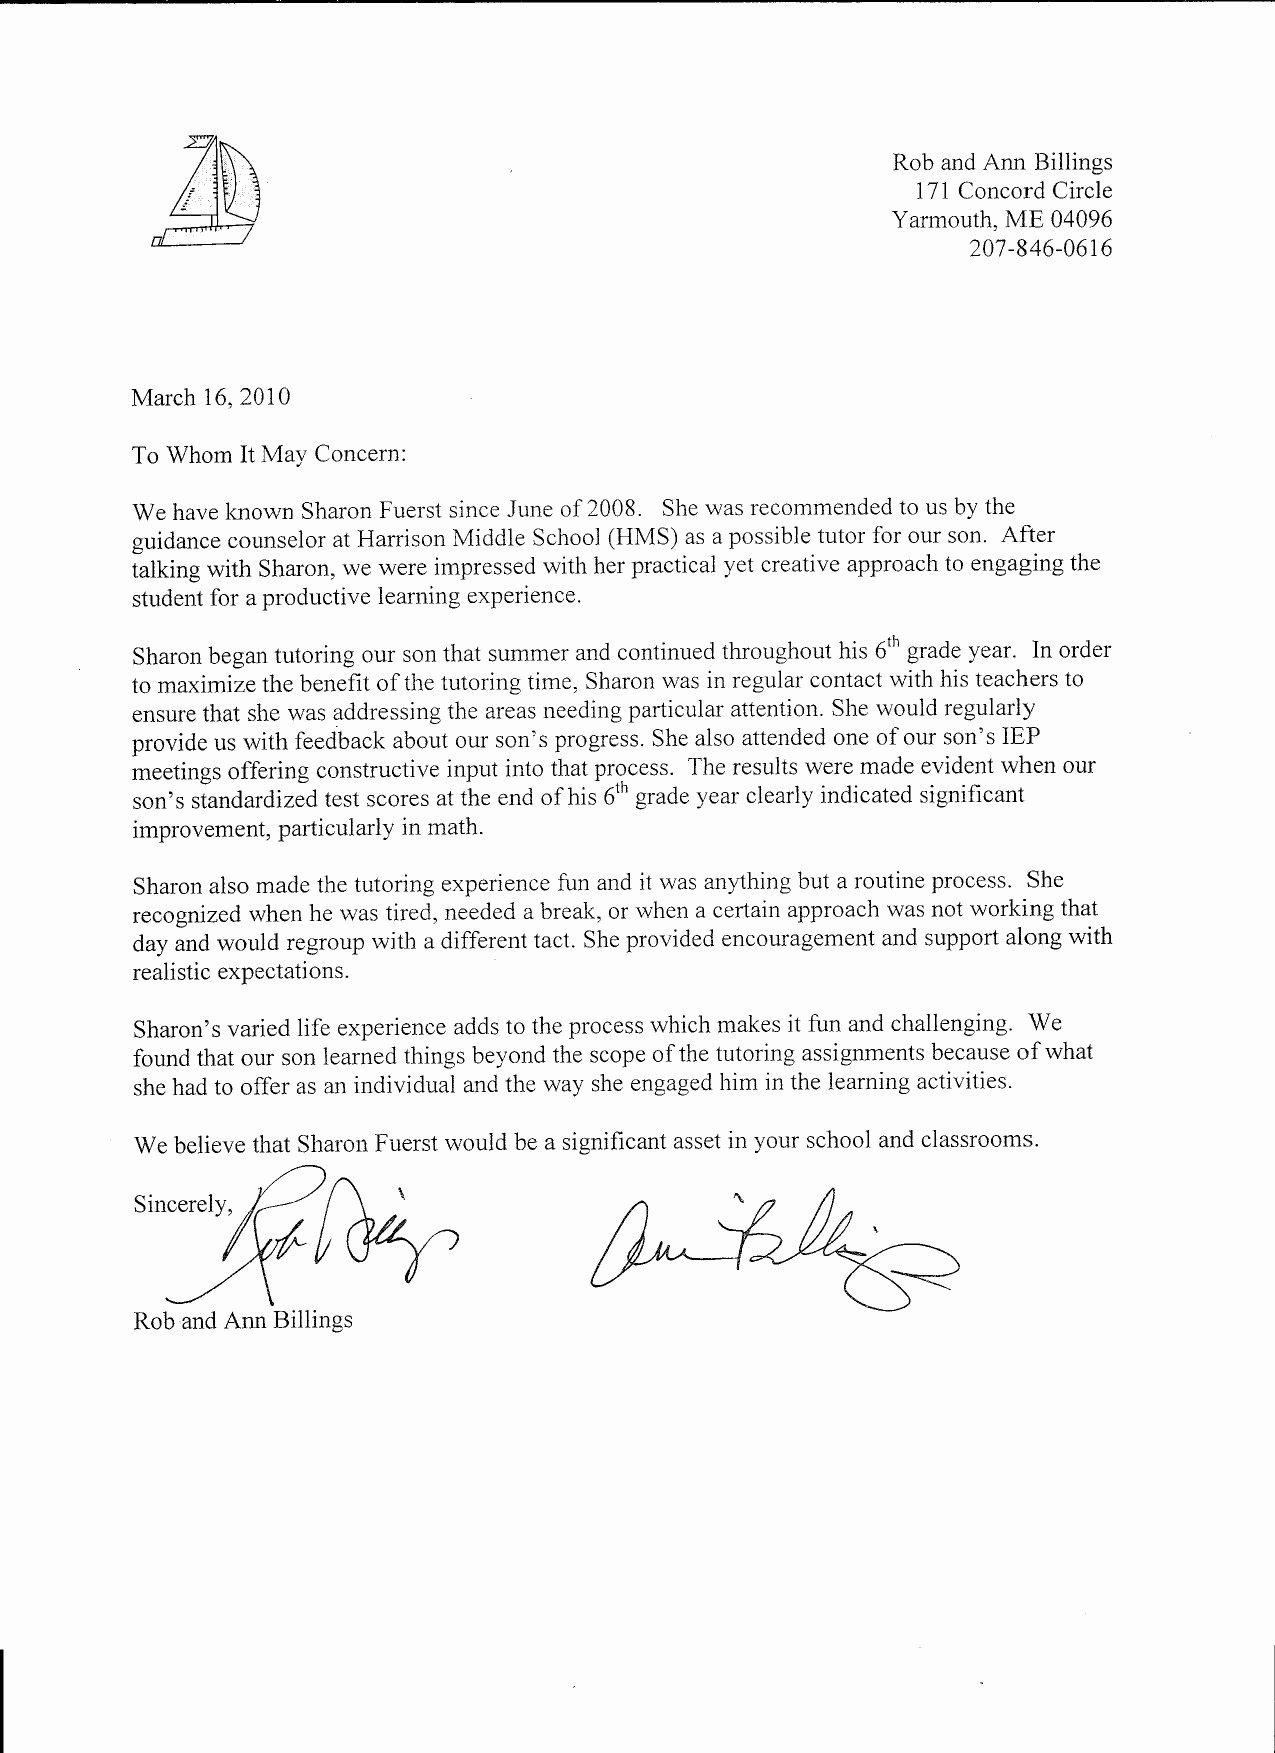 Teacher Re Mendation Letter Help Stonewall Services